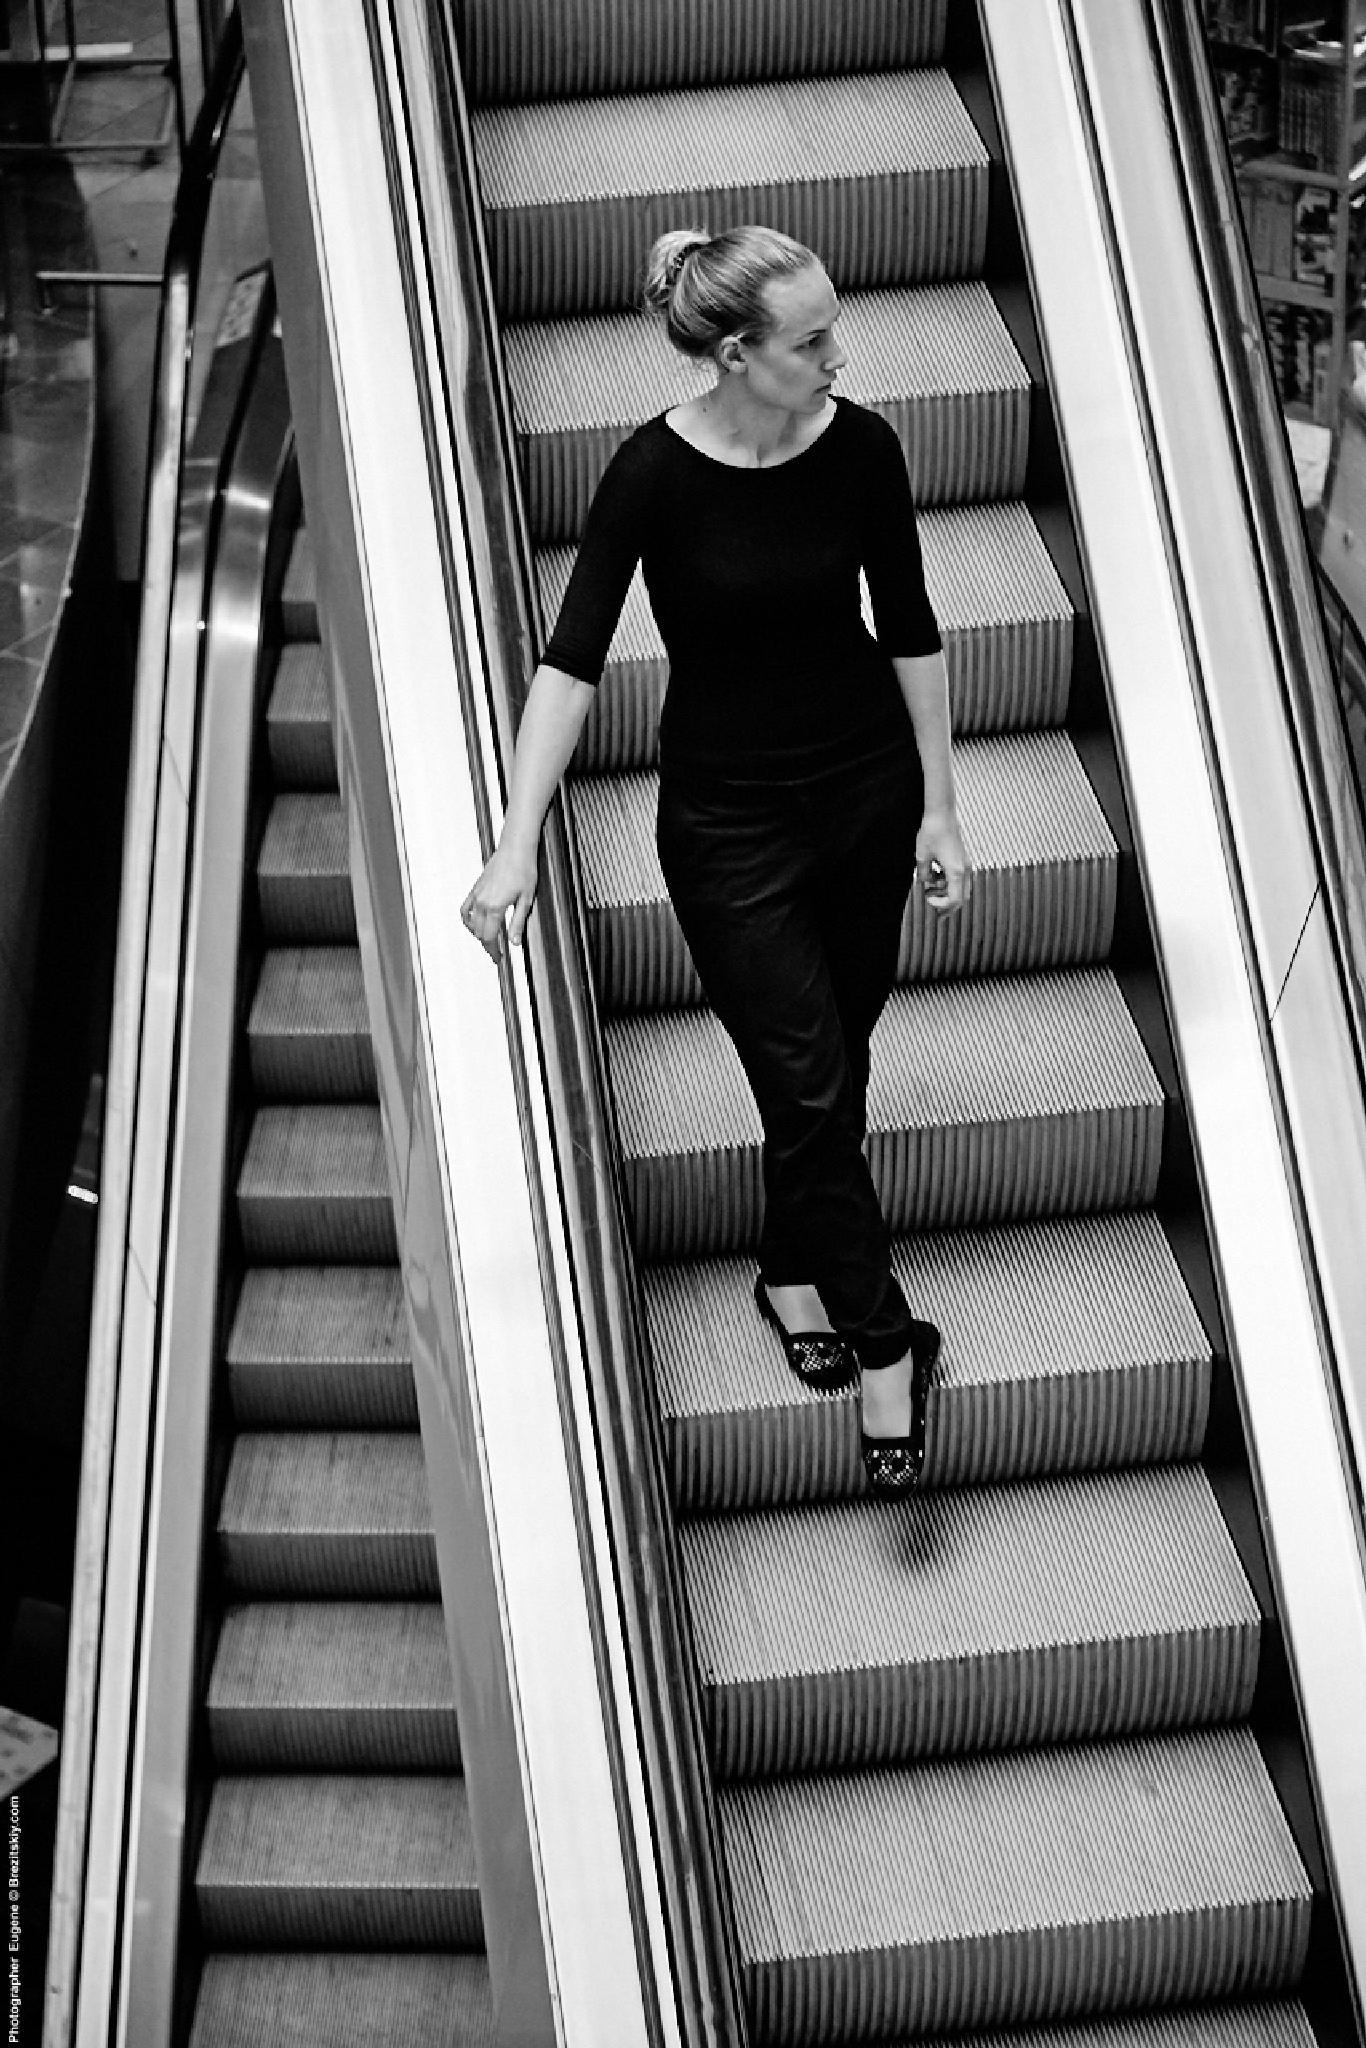 Escalator by Eugene Brez